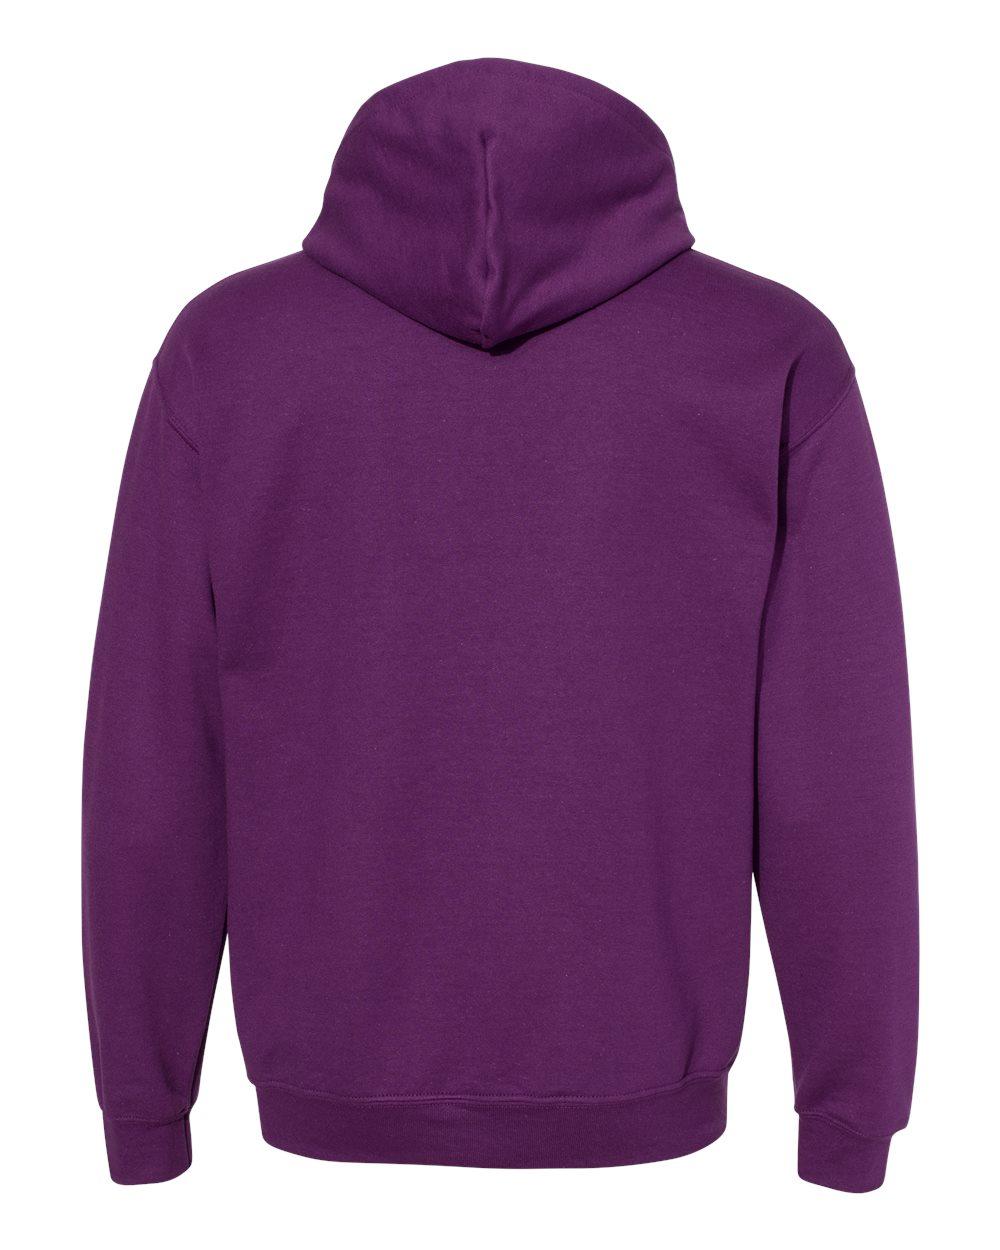 Gildan-Mens-Blank-Hoodie-Heavy-Blend-Hooded-Sweatshirt-18500-up-to-5XL thumbnail 46